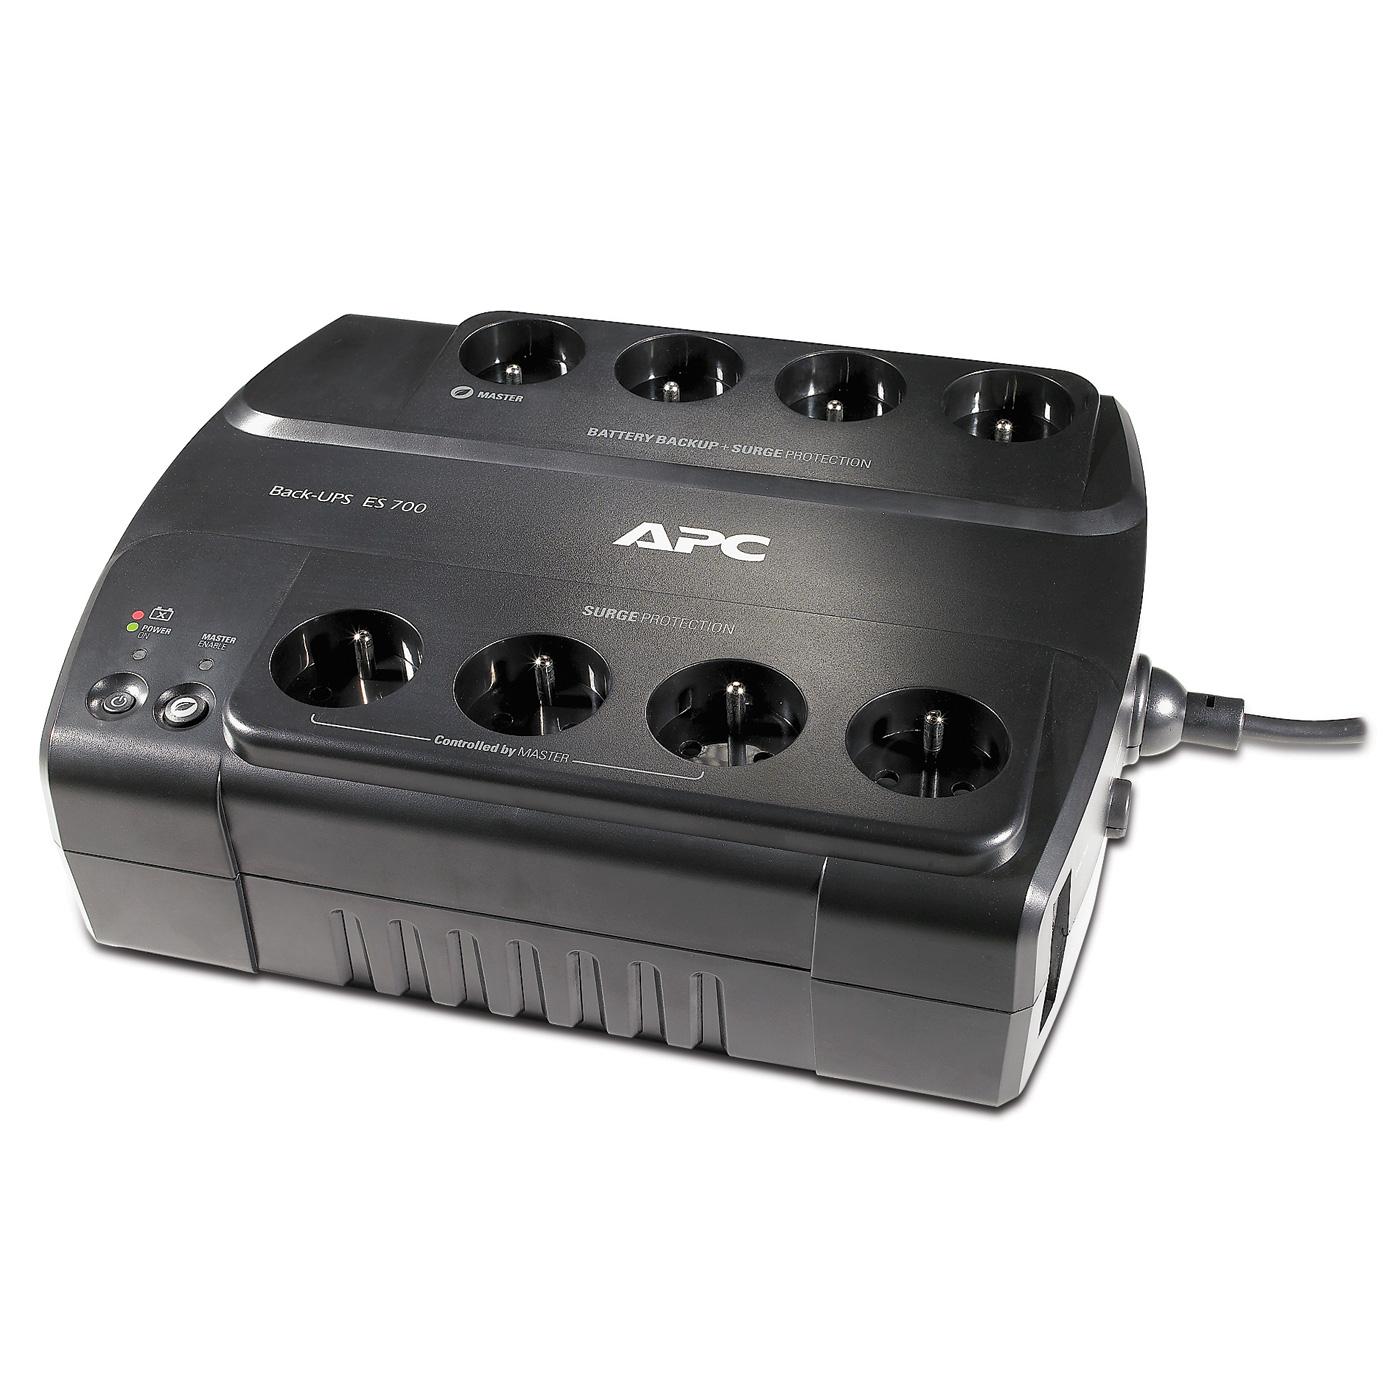 Onduleur APC Back-UPS ES 700VA (BE700G-FR) Onduleur off-line monophasé 230V (USB)